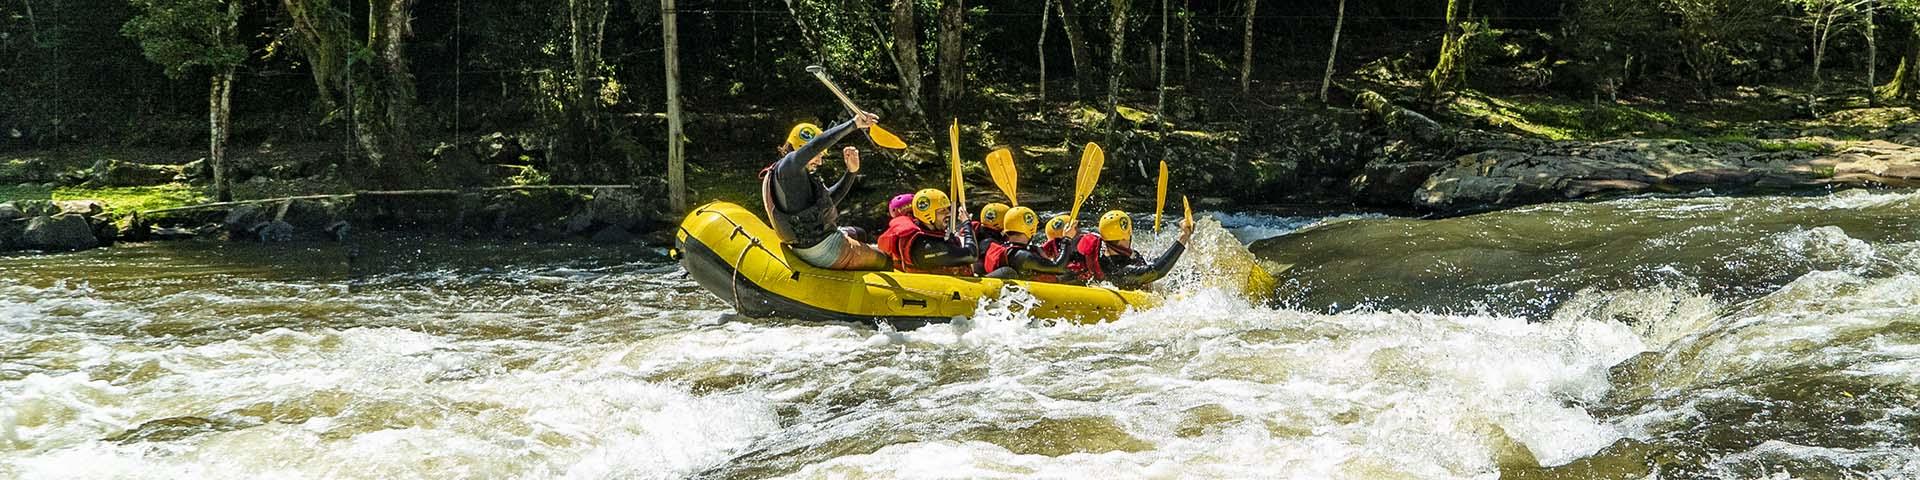 Raft-Adventure-Park-Rafting-Bonitour-Passeios-serra-gaucha-sc-2073906_4900.jpg